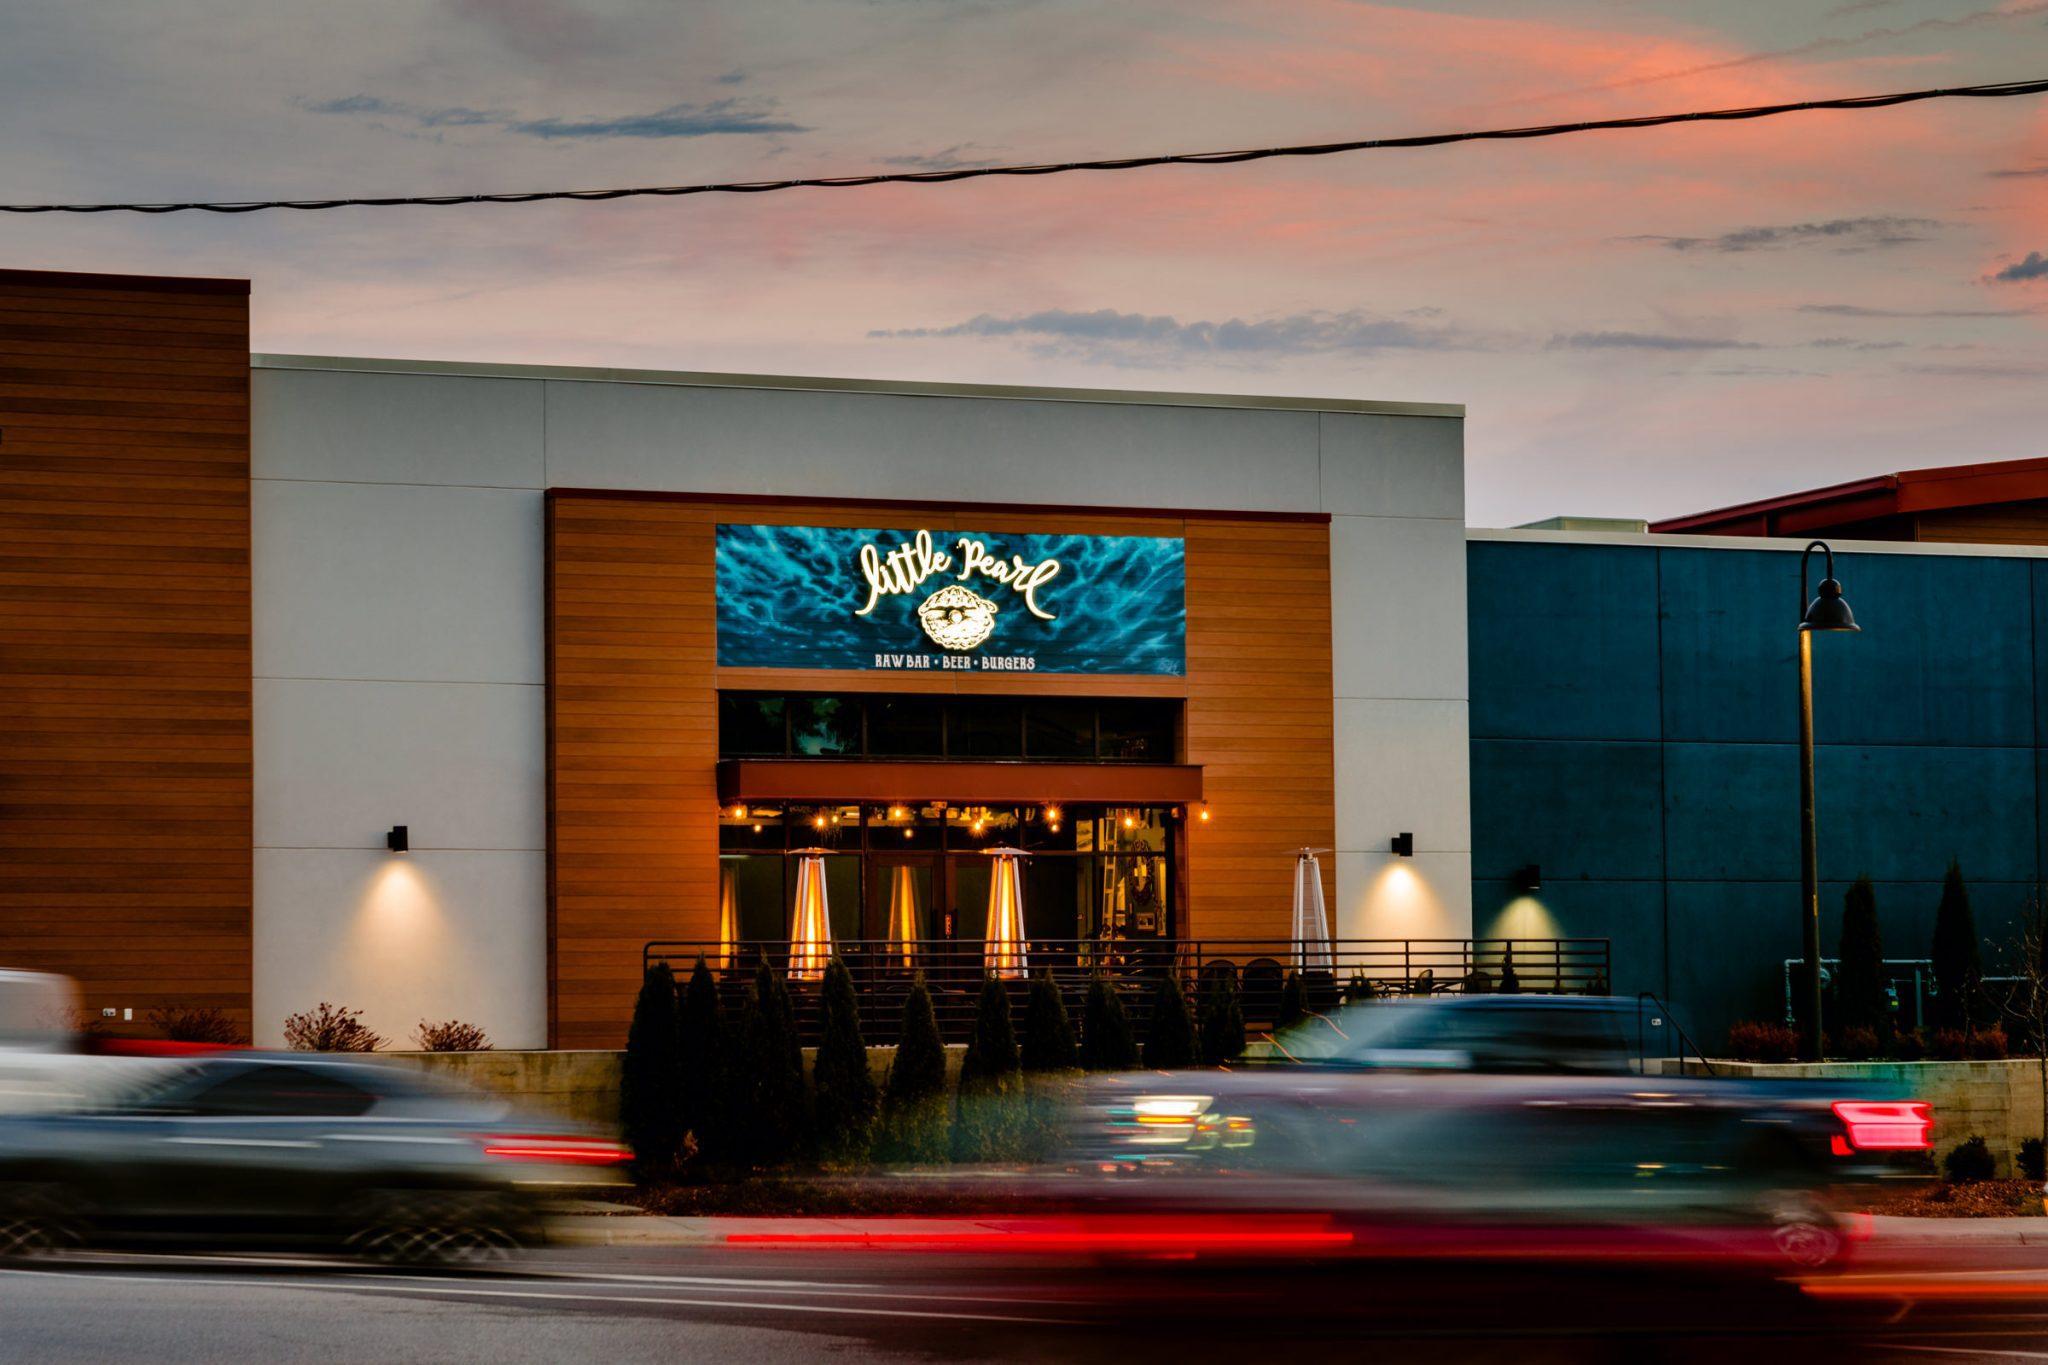 Commercial photoshoot for restaurant in the florida keys